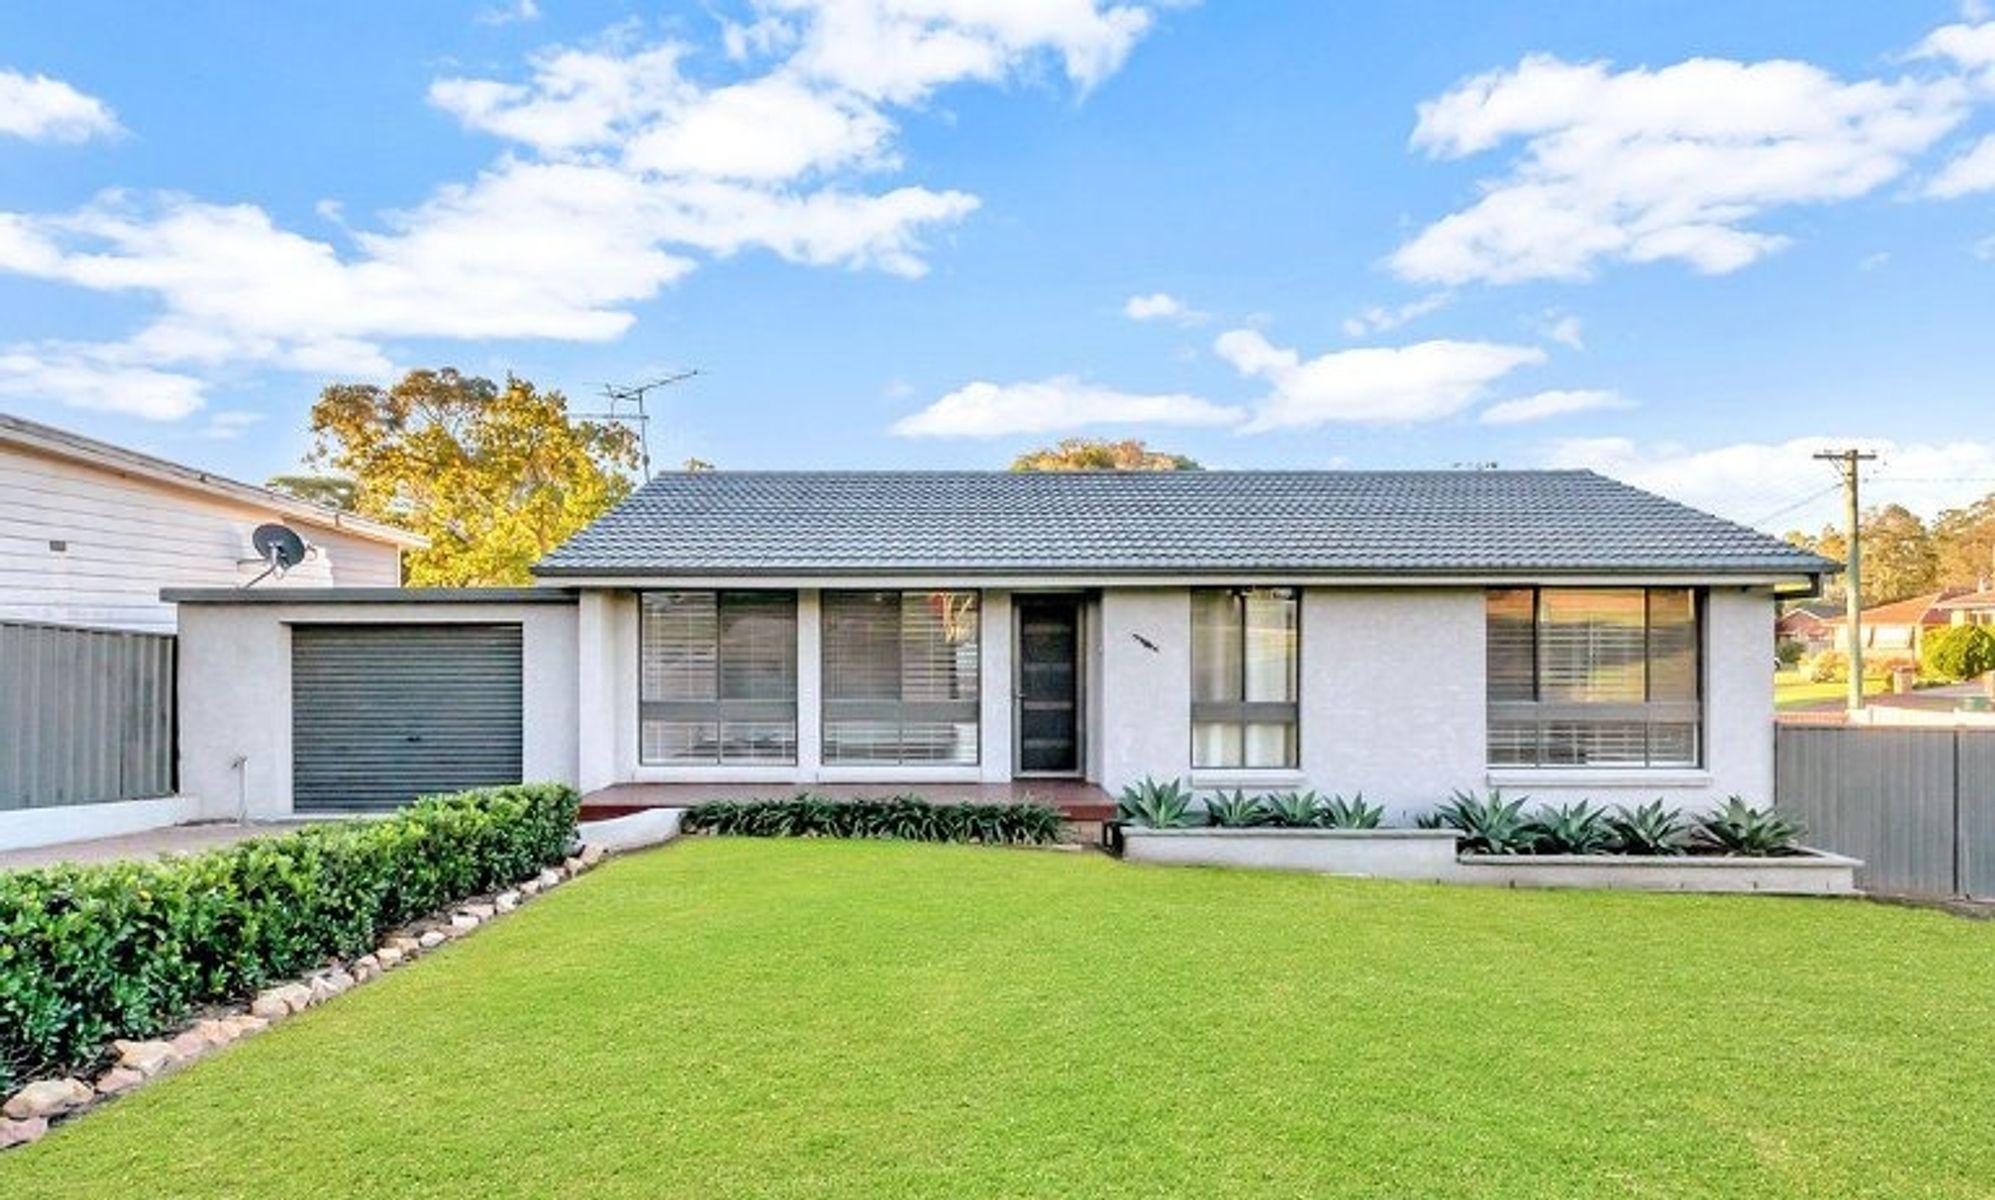 14 Lelia Avenue, Freemans Reach, NSW 2756